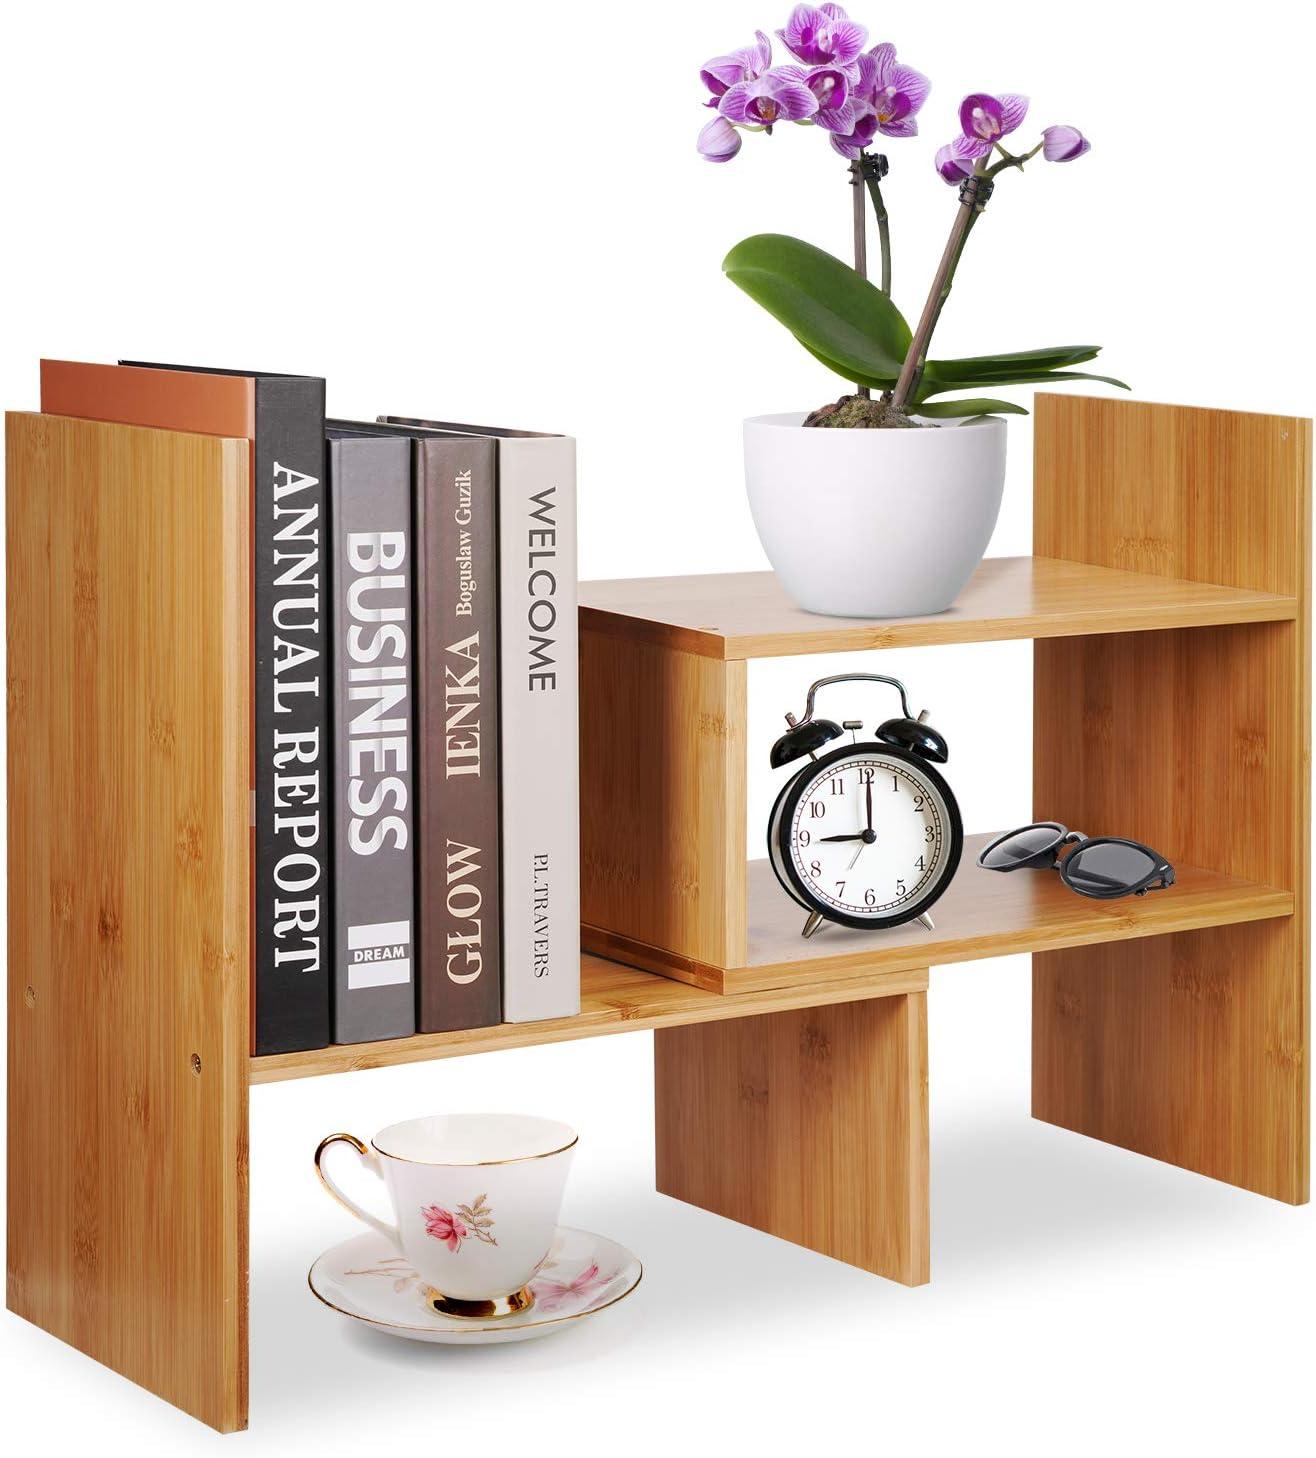 Adjustable Virginia Beach Mall Challenge the lowest price Natural Wood Desktop Bookshelf Bamboo Or Desk Storage